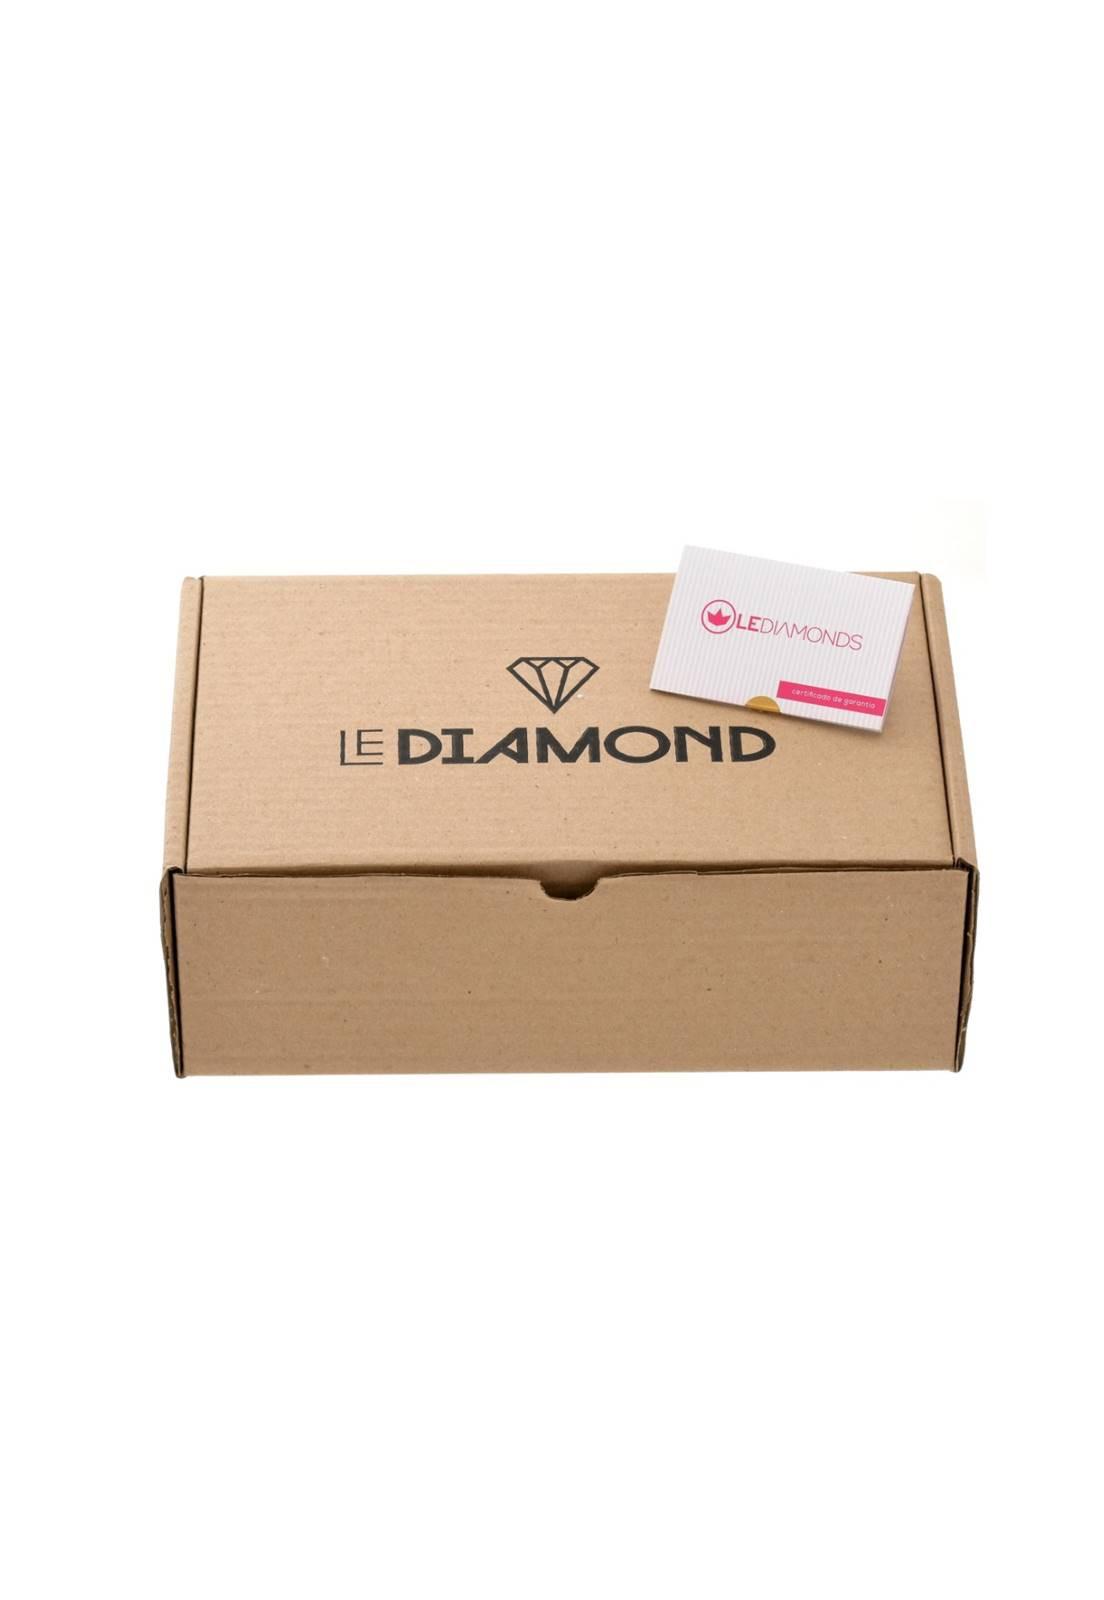 Brinco Le Diamond Brinco Gante Base Retangulo com Aro de Cristal Prata